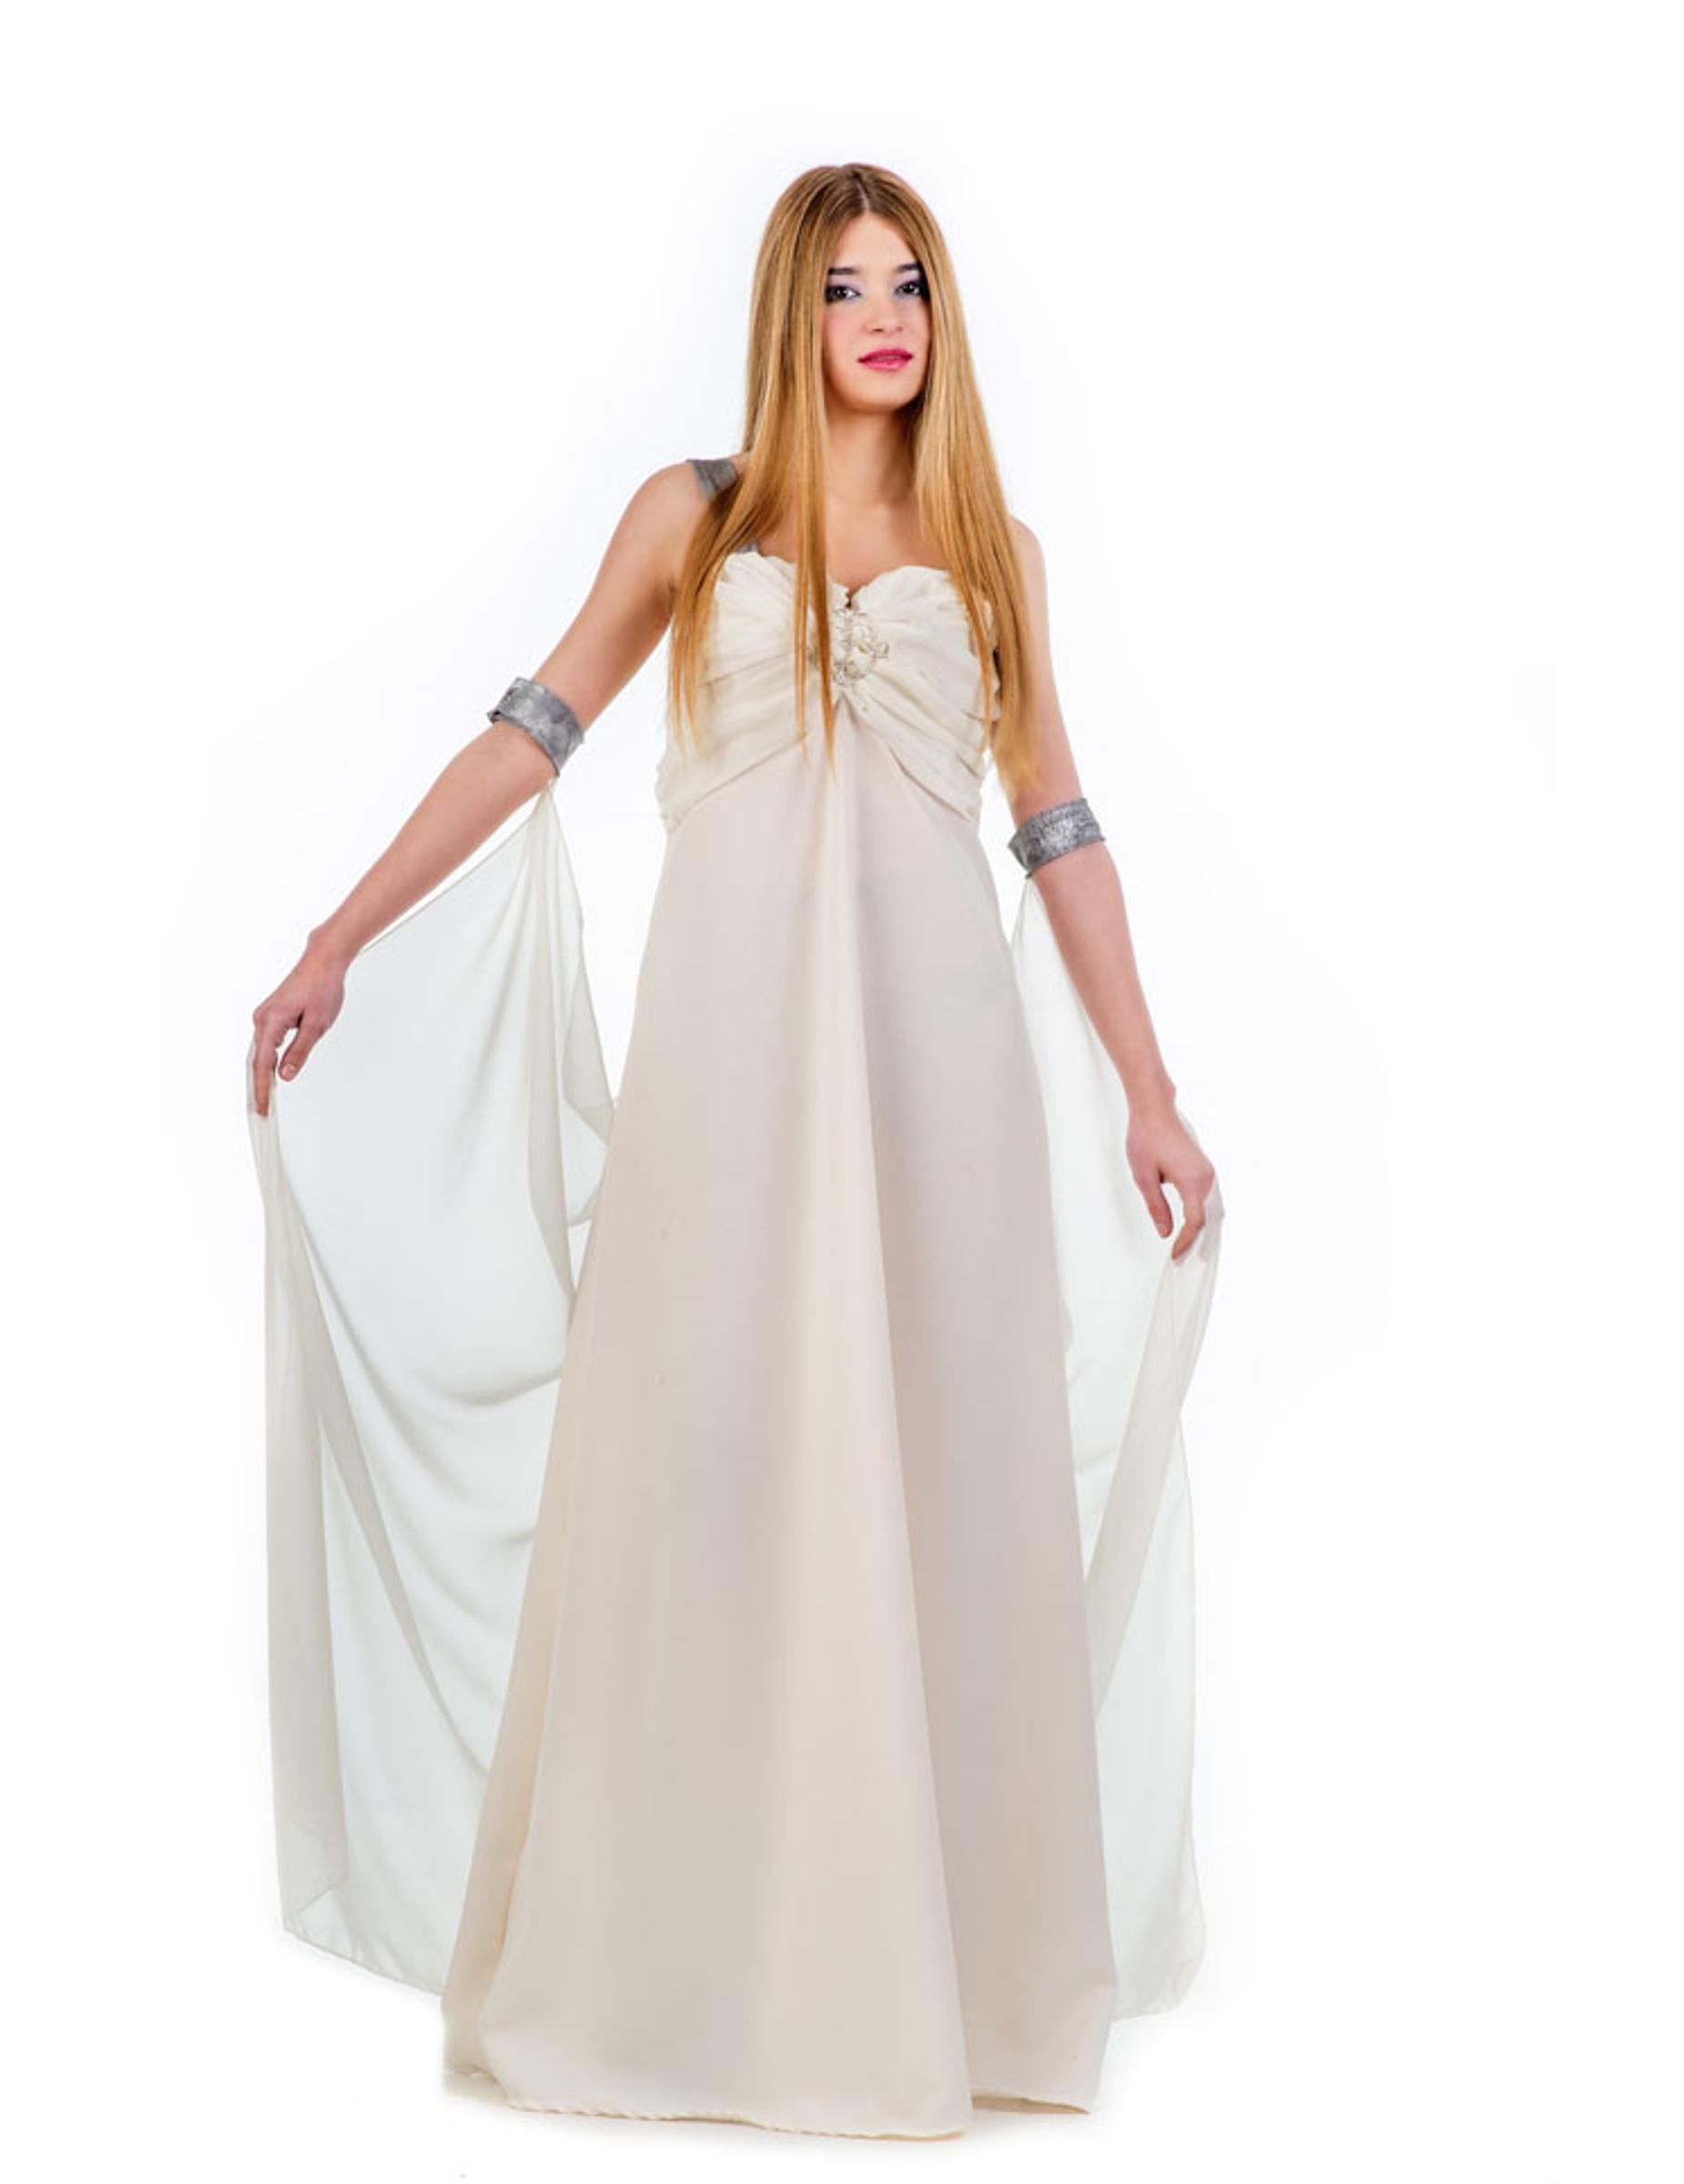 robe de princesse blanche adulte. Black Bedroom Furniture Sets. Home Design Ideas